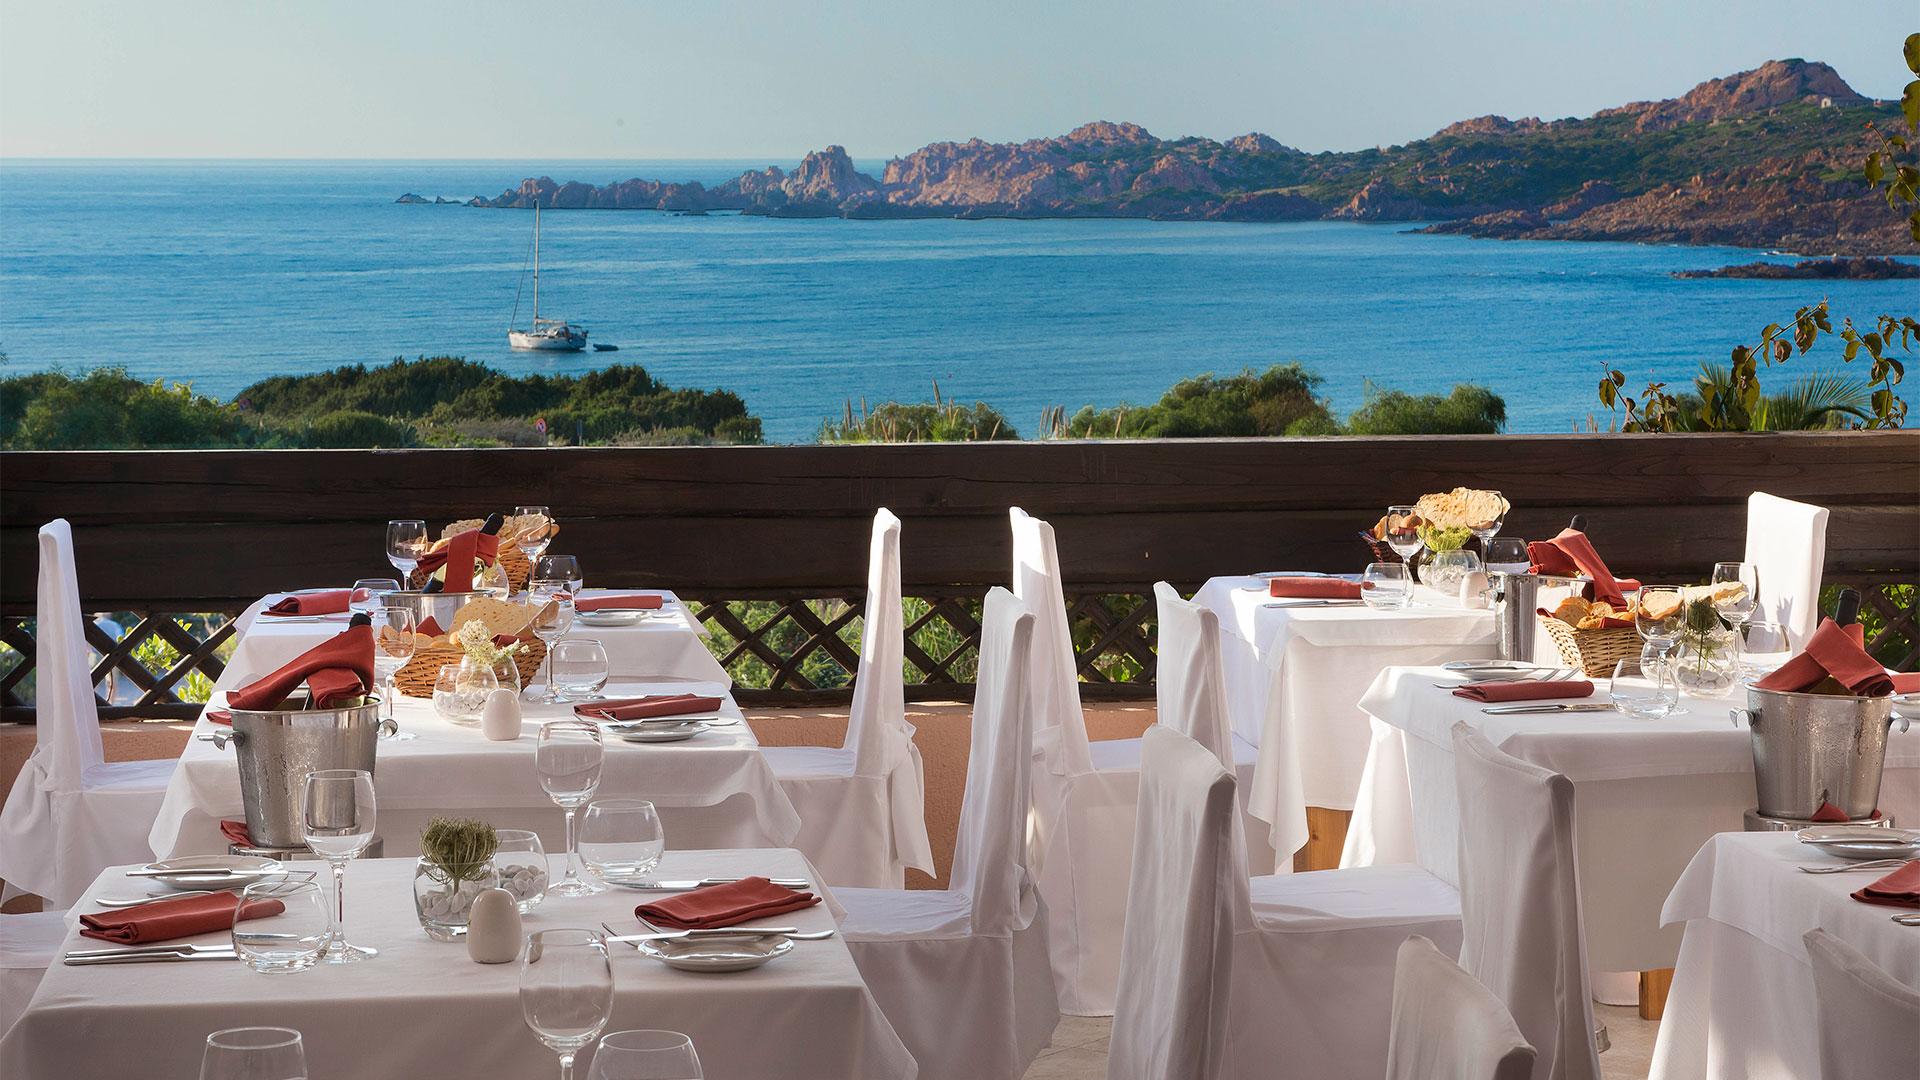 hotel-marinedda-slider-ristoranti-sardegna-mare-isola-rossa-4